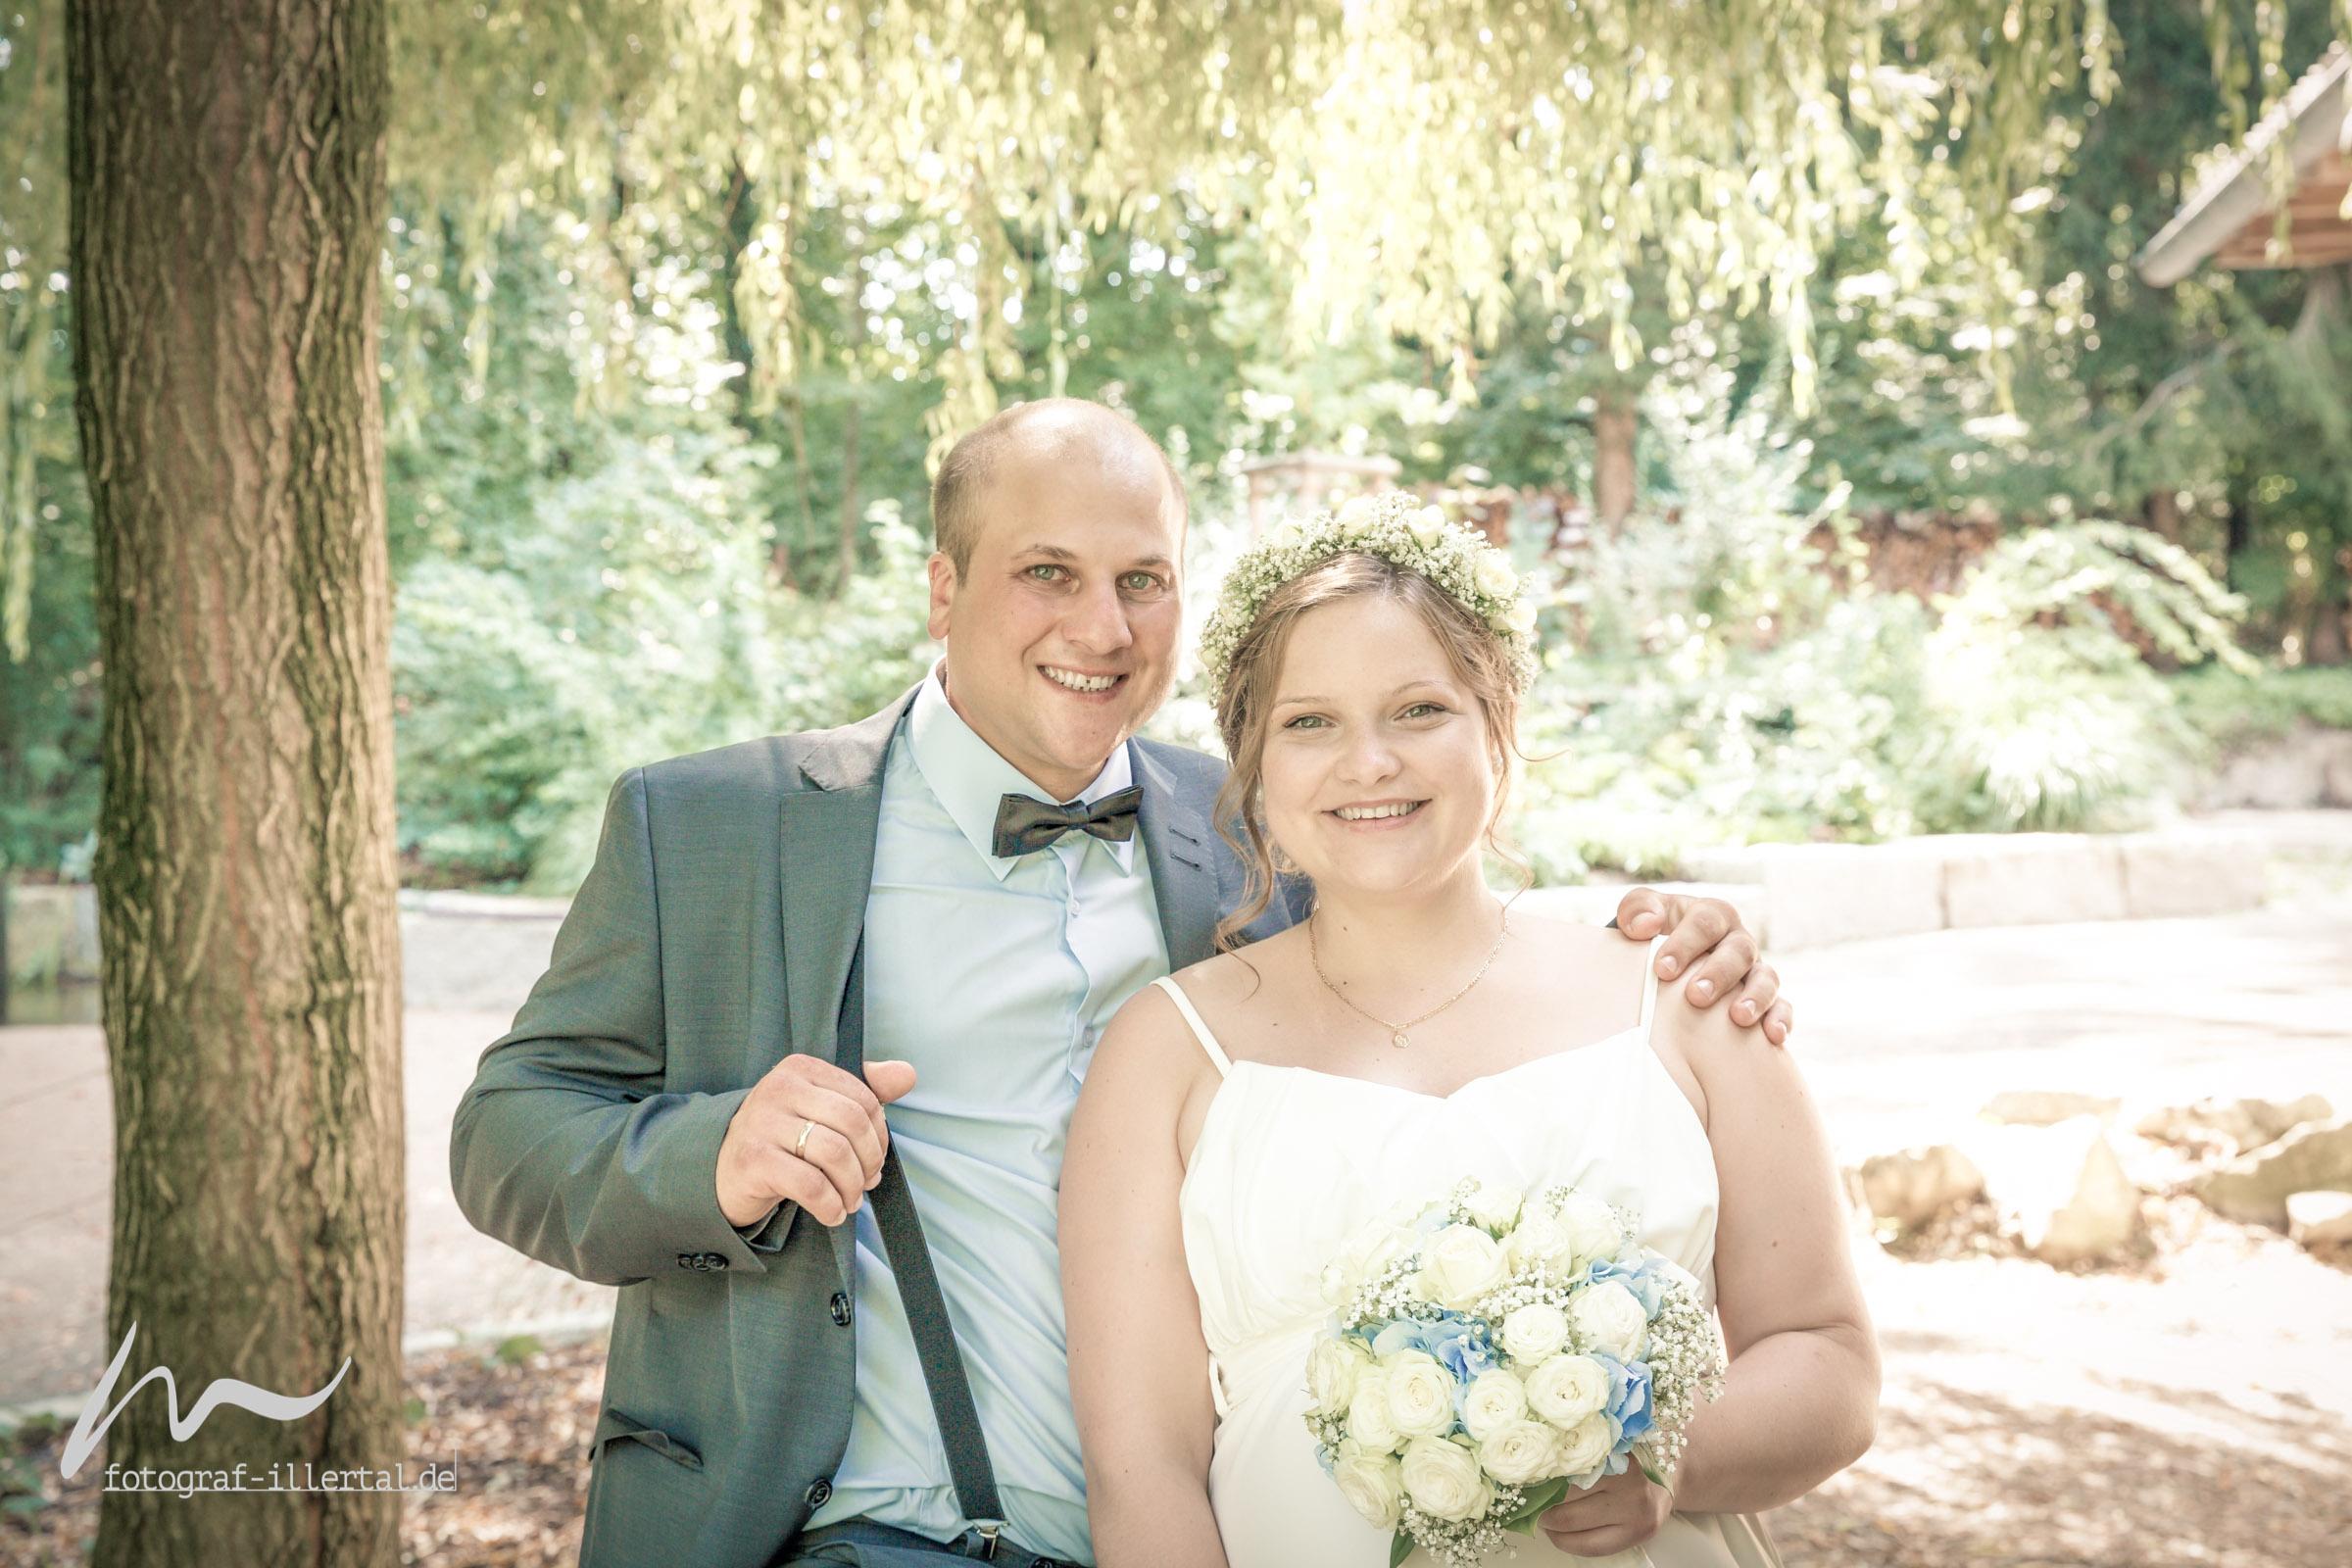 Fotograf Illertal-Christian Miller-Hochzeitsfotografie-_MG_5867